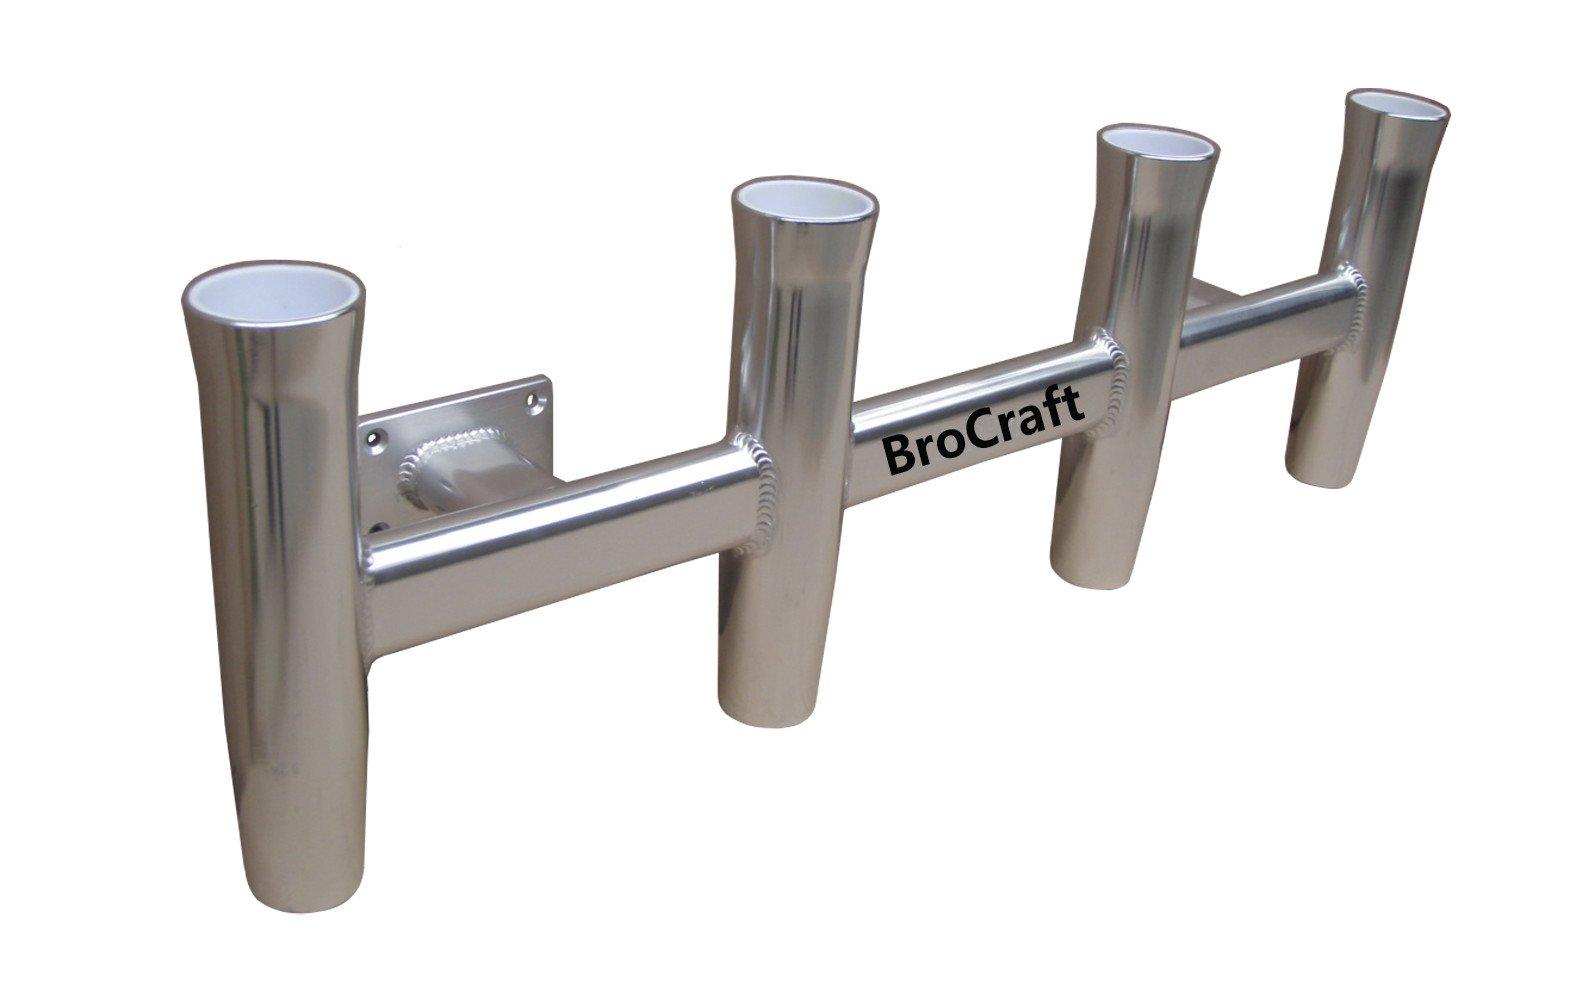 BroCraft Aluminum Wall Mounted 4 Pole Rocket Launcher / Boat Rod Holders / Boat Rocket Launcher by Brocraft